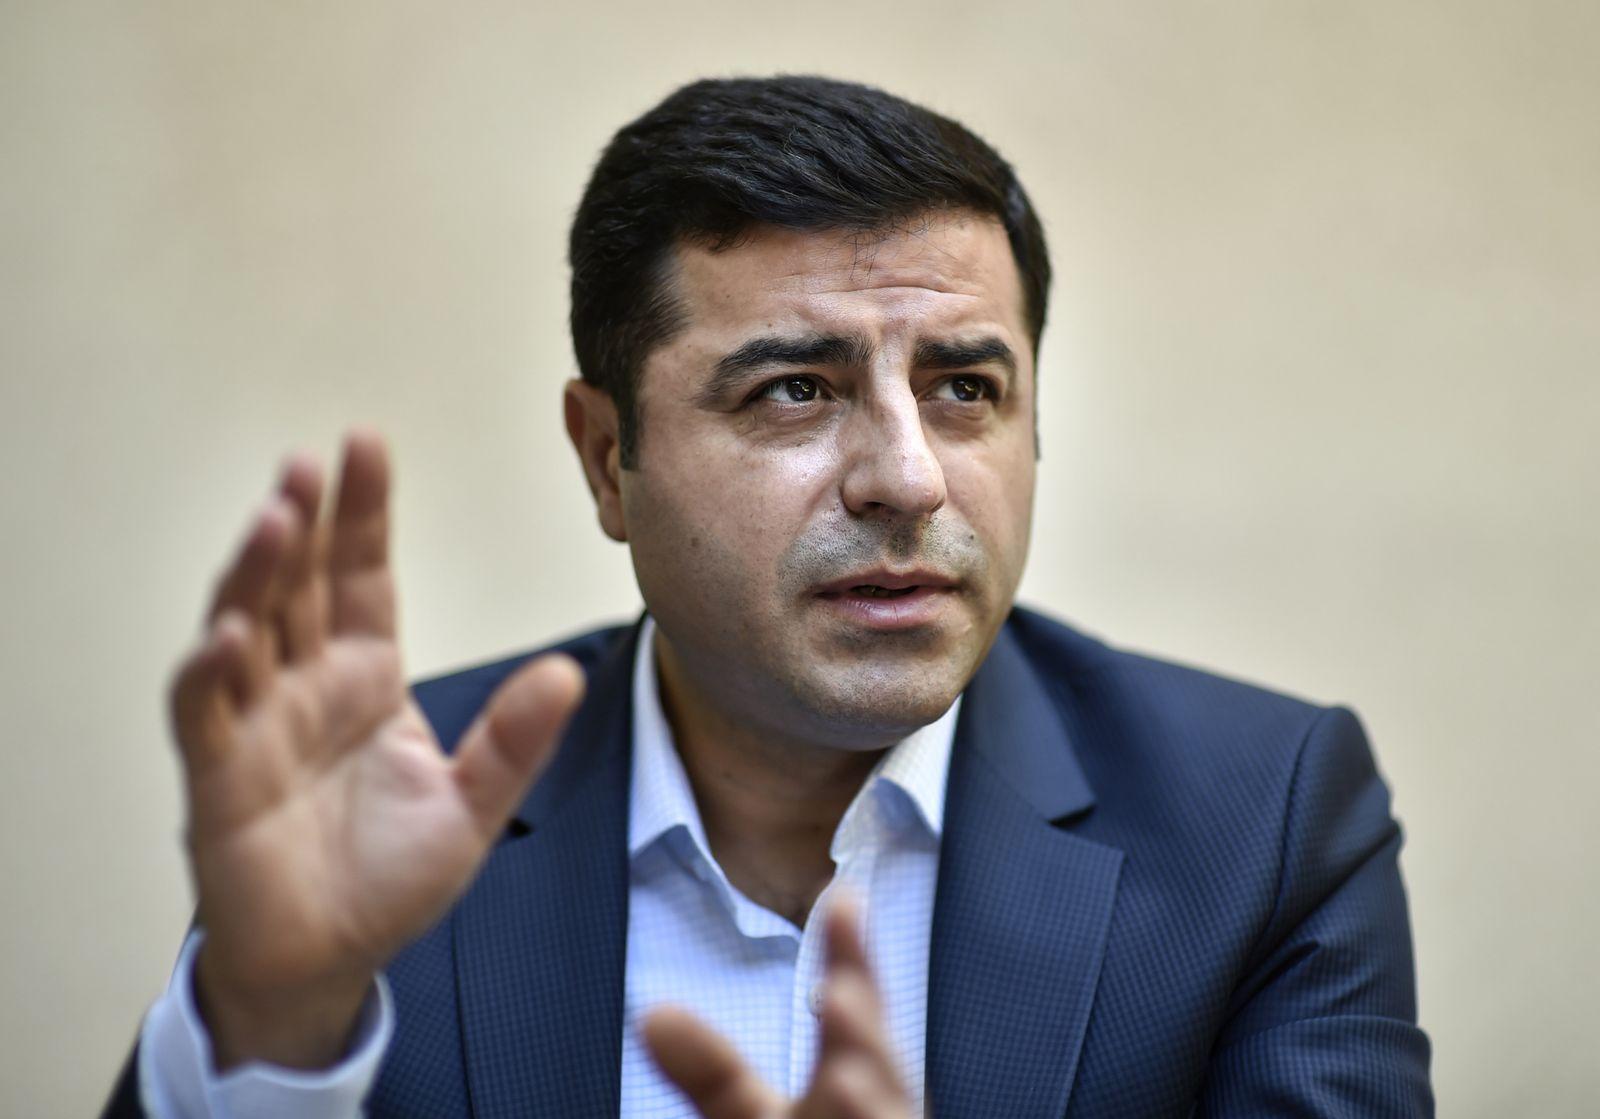 BELGIUM-EU-TURKEY-SYRIA-CONFLICT-KURDS-HDP